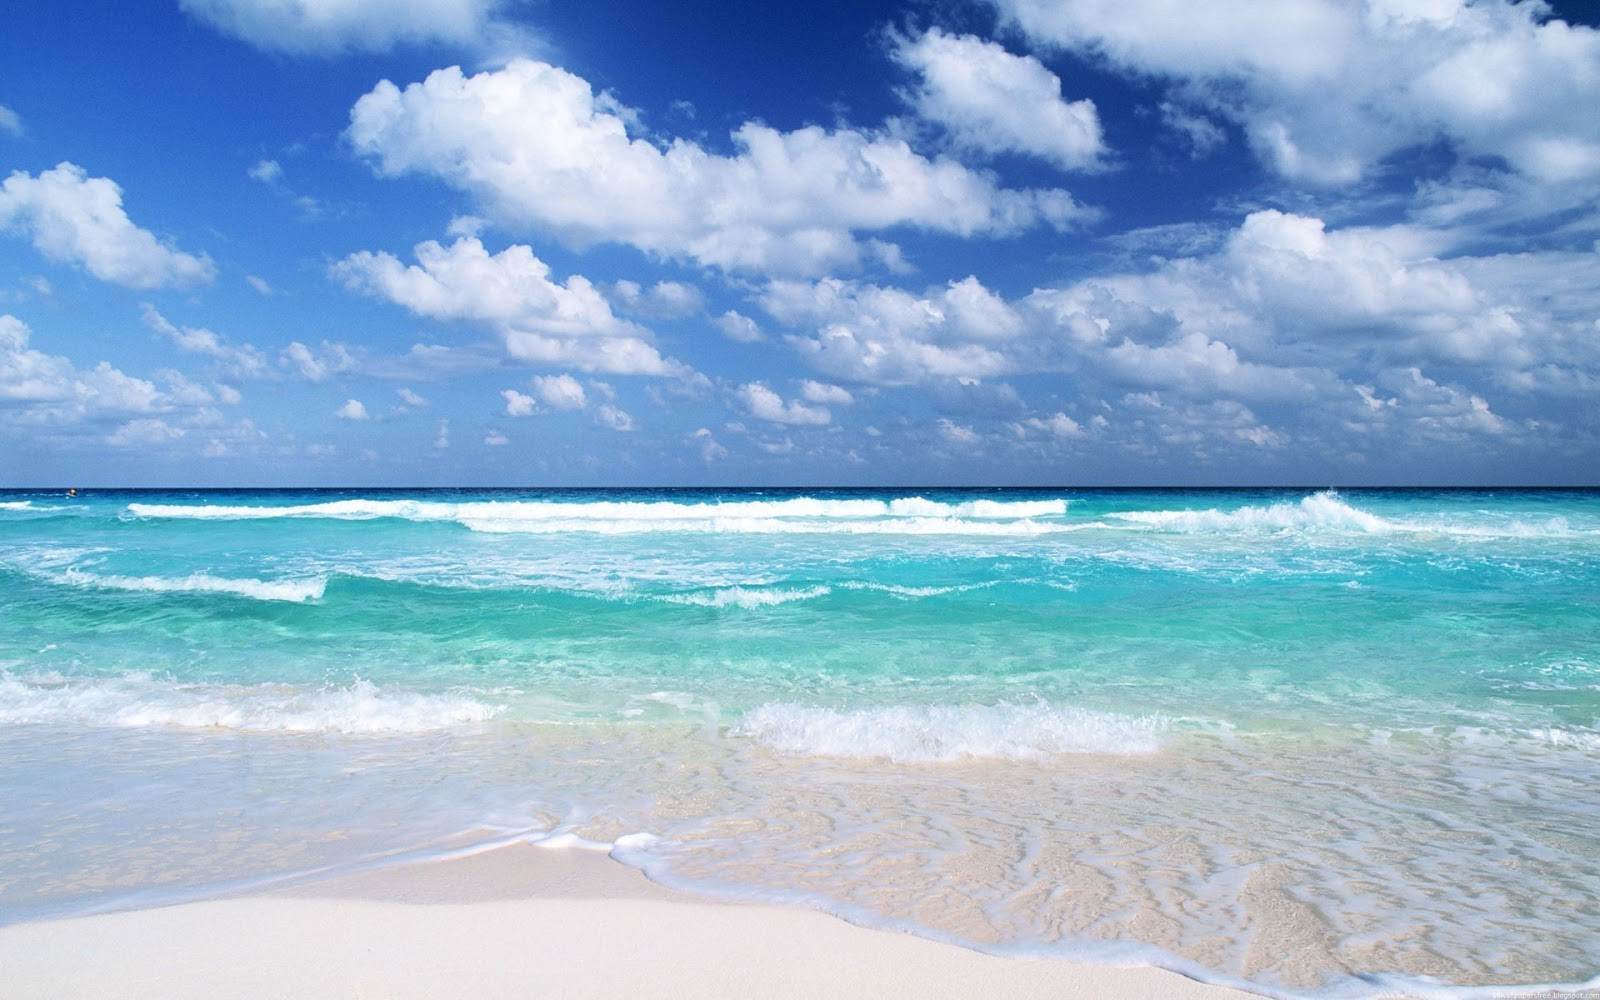 Hd wallpaper beach - Beach Wallpaper Beach Hd Wallpaper Free Computer Wallpaper Free